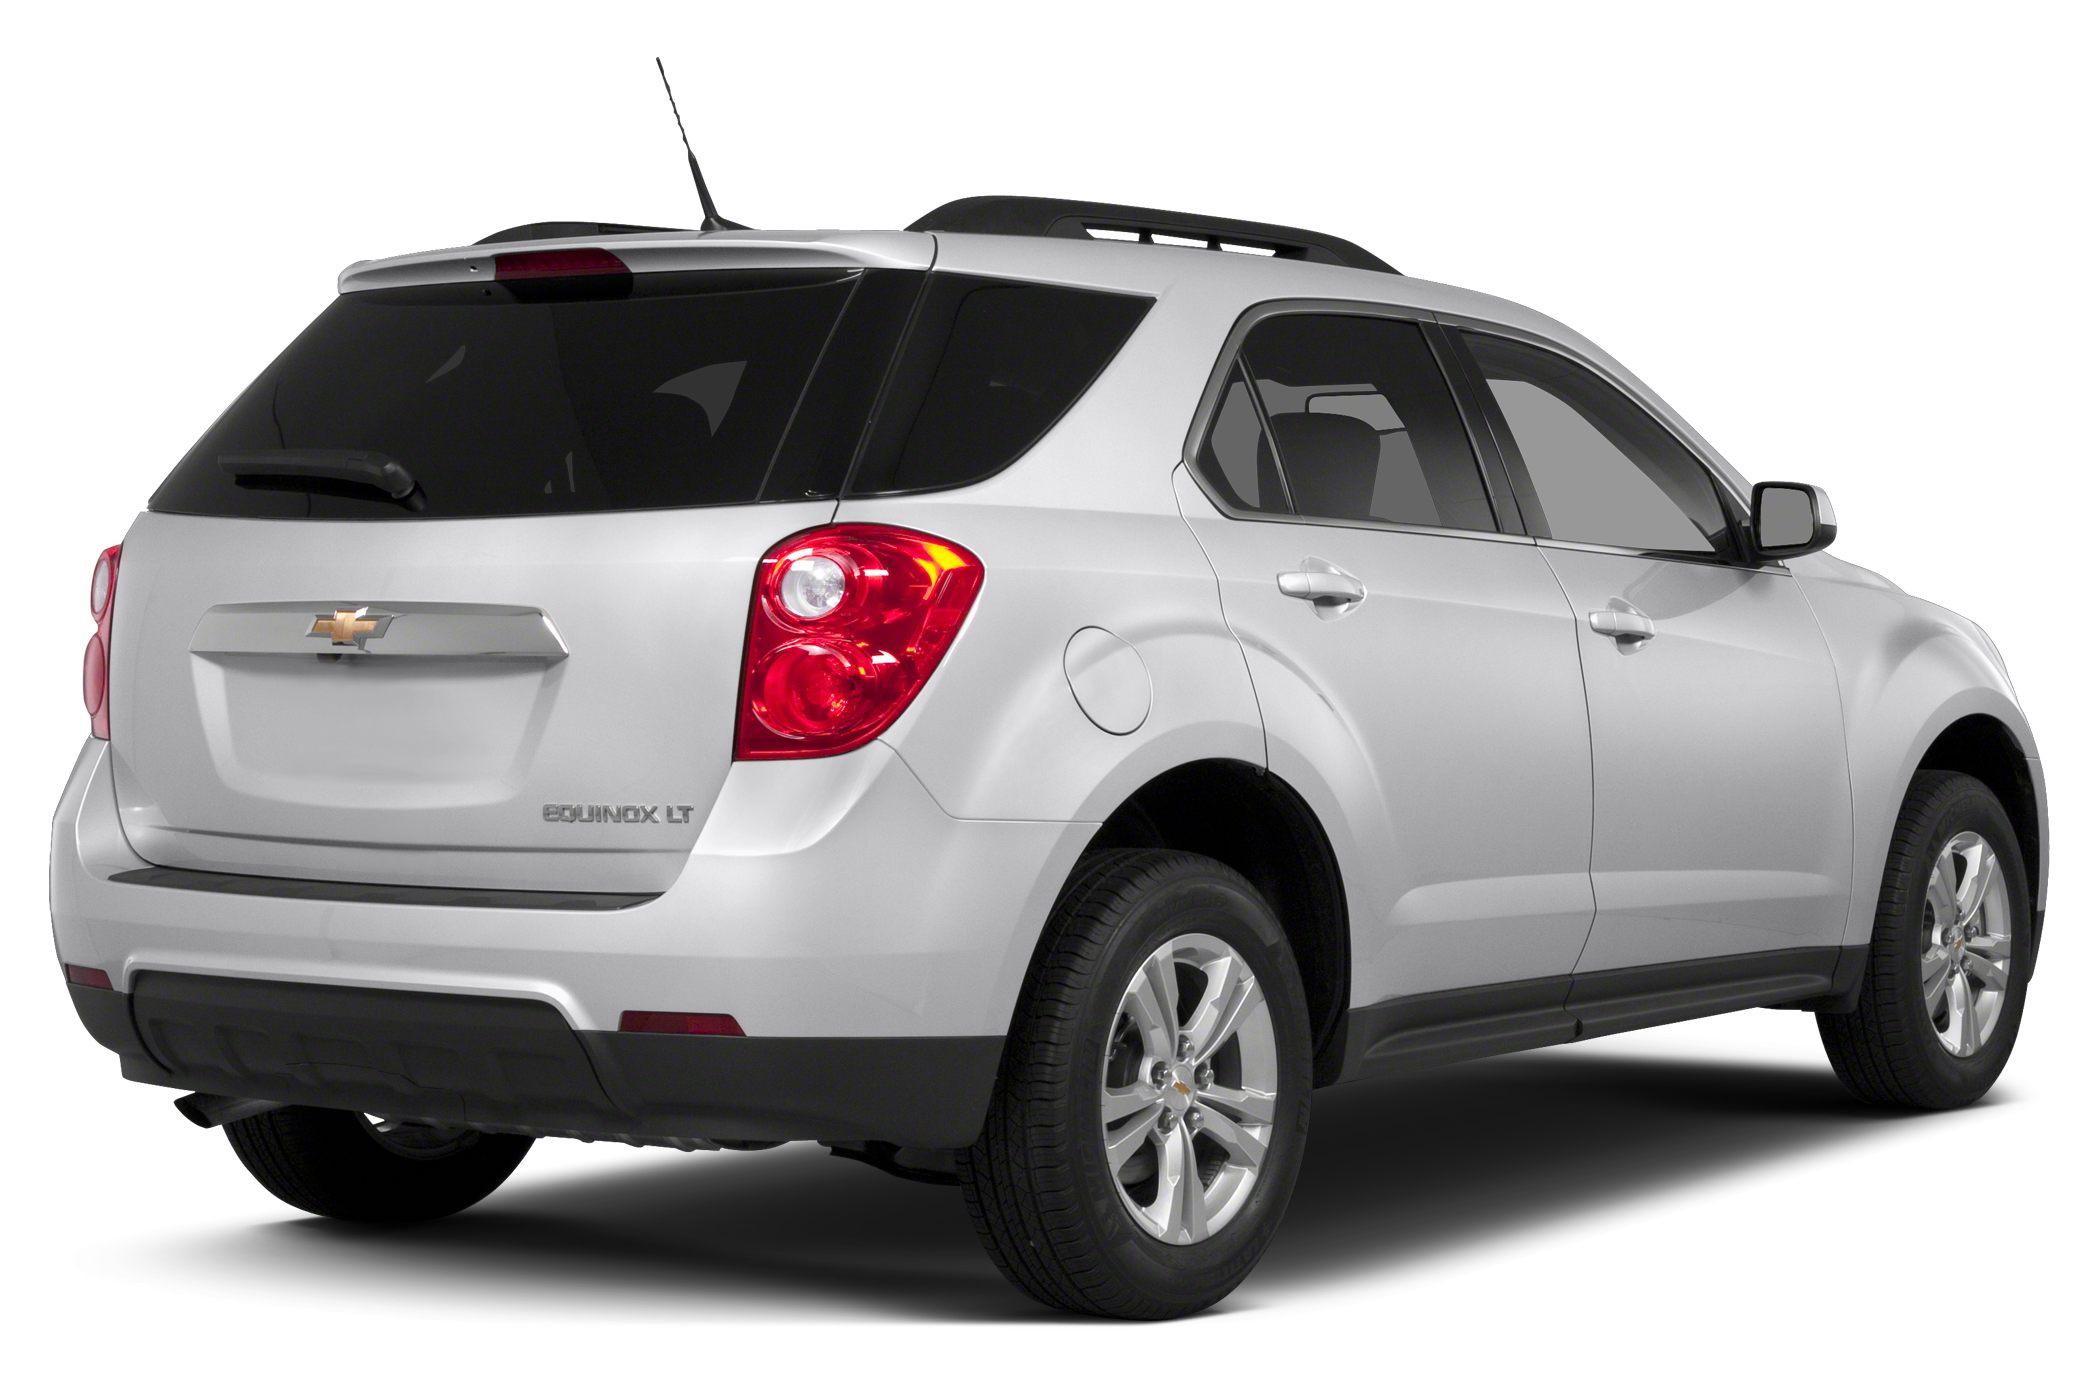 2014 Chevrolet Equinox LT w1LT 3-DAY EXCHANGE Miles 69784Color Gray Stock P2084 VIN 2GNA